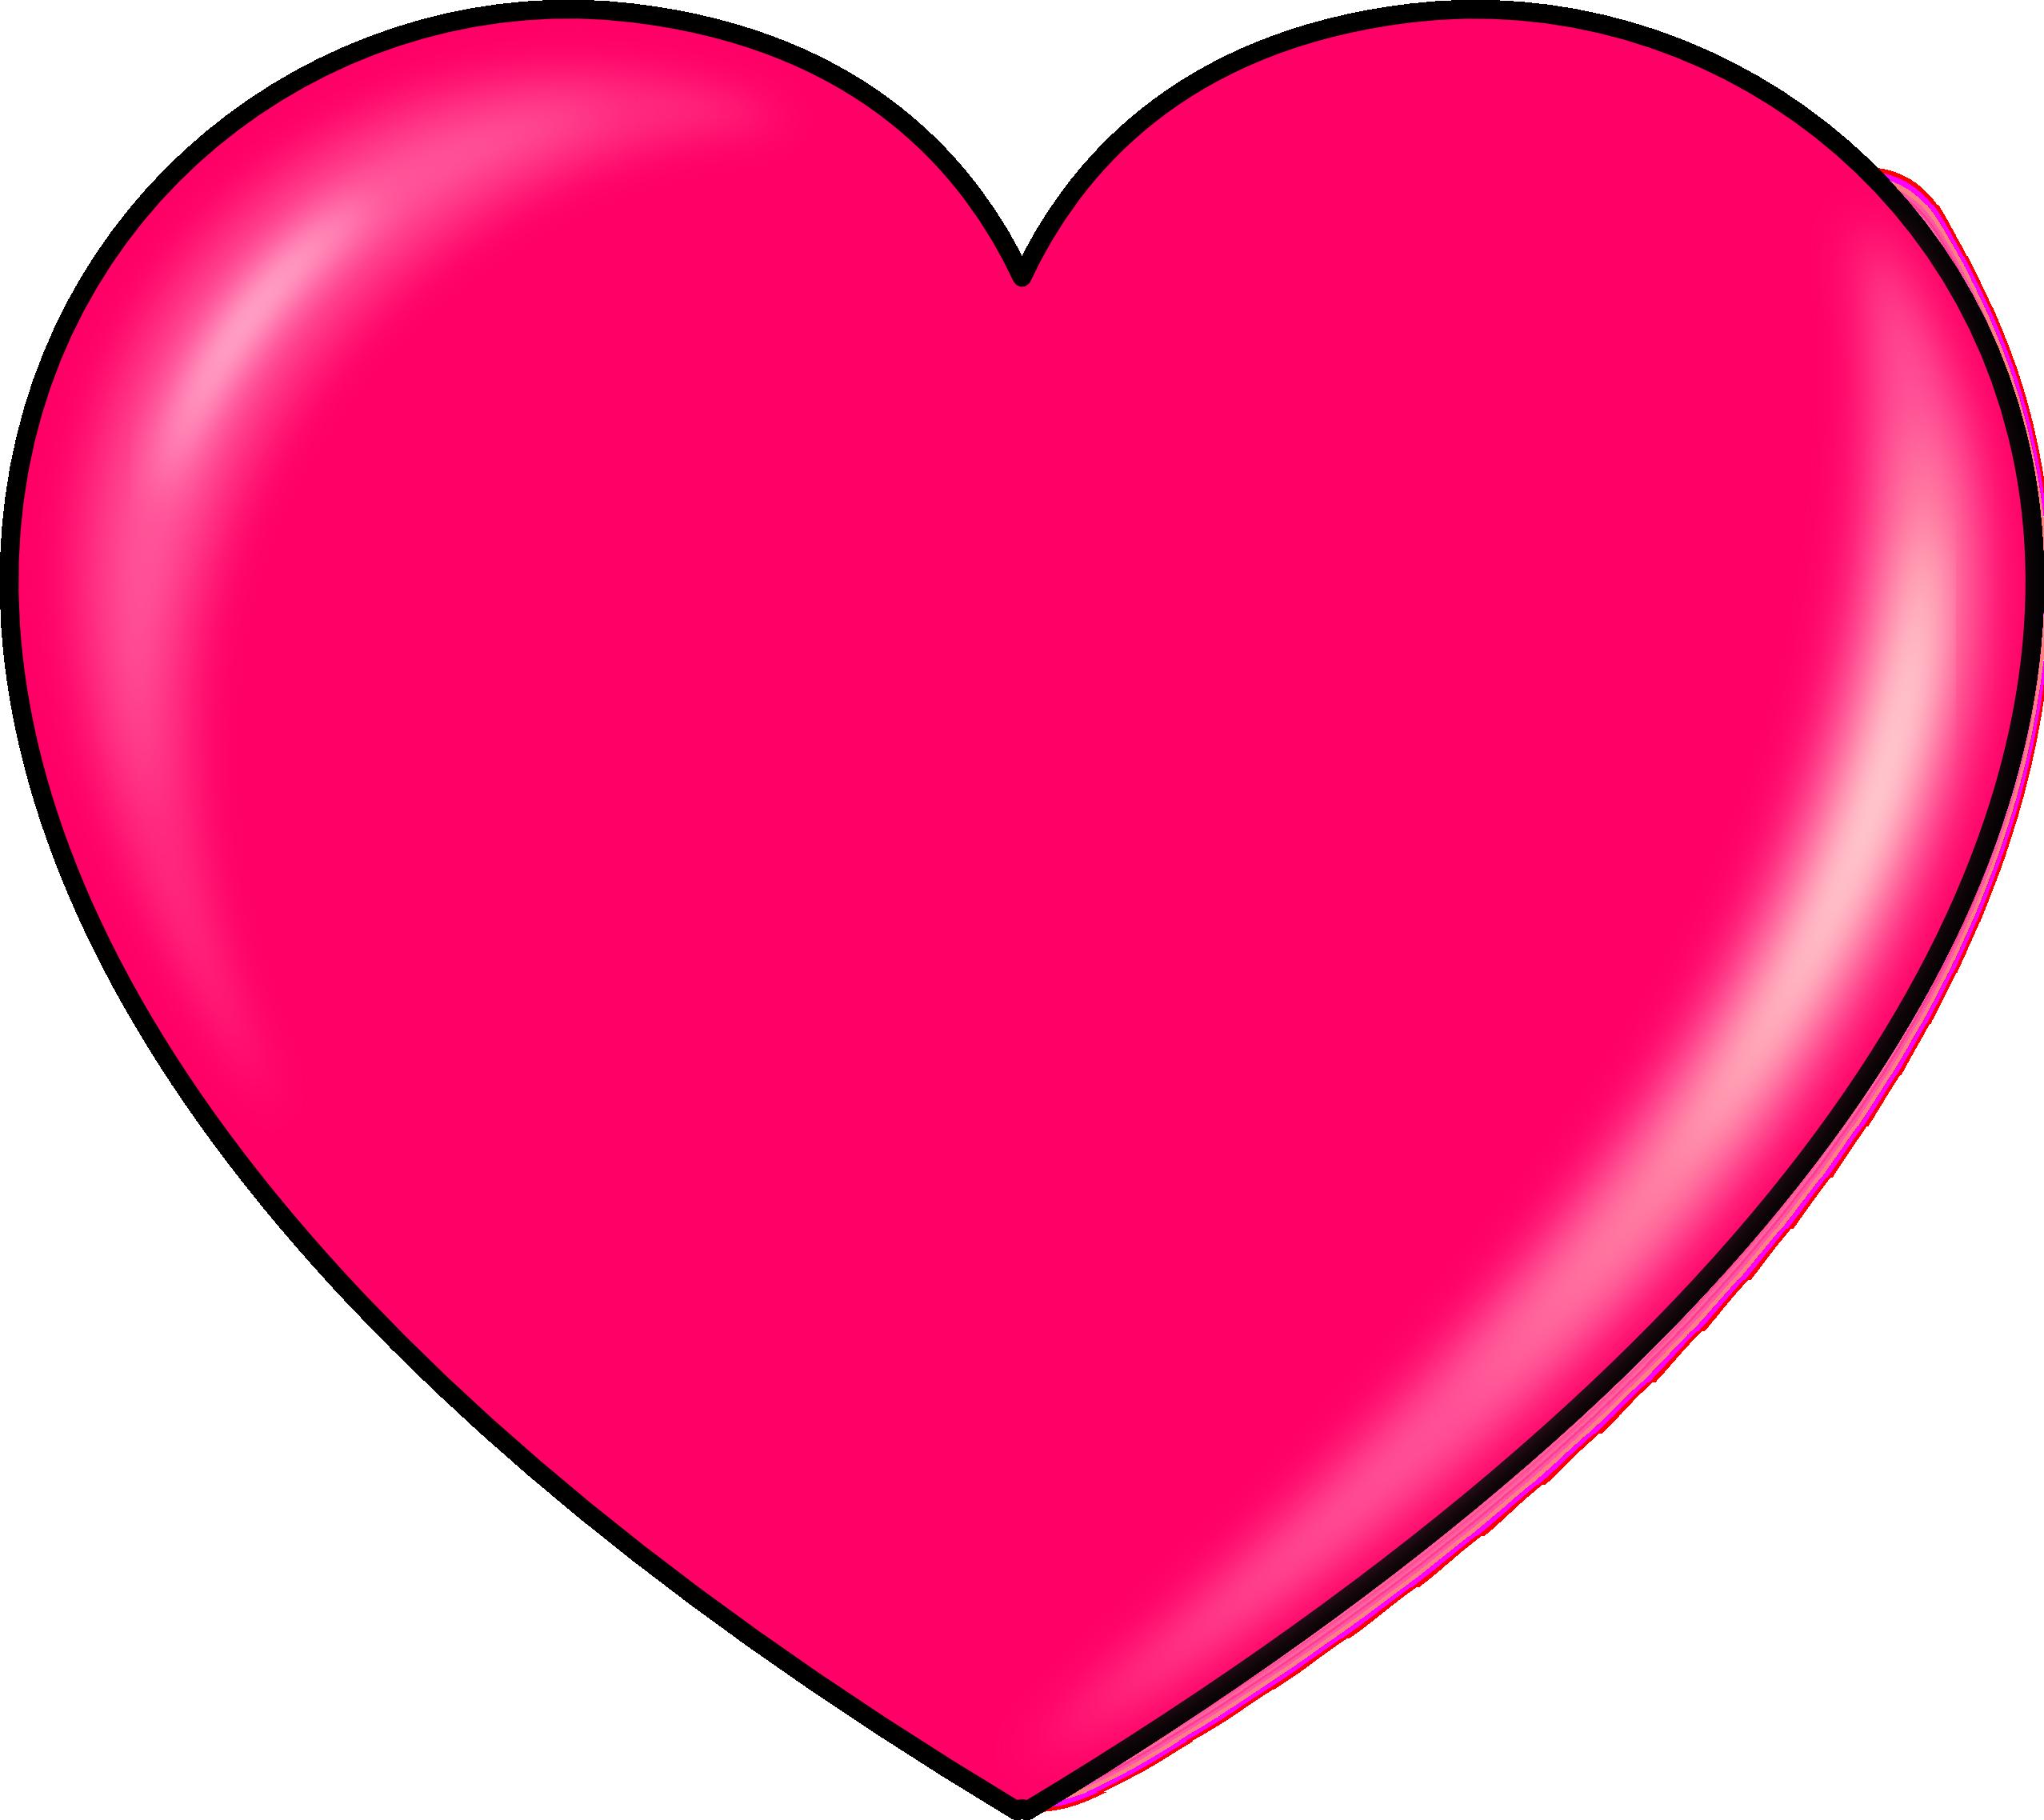 Hot Pink Heart Transparent PNG PNG, SVG Clip art for Web ...